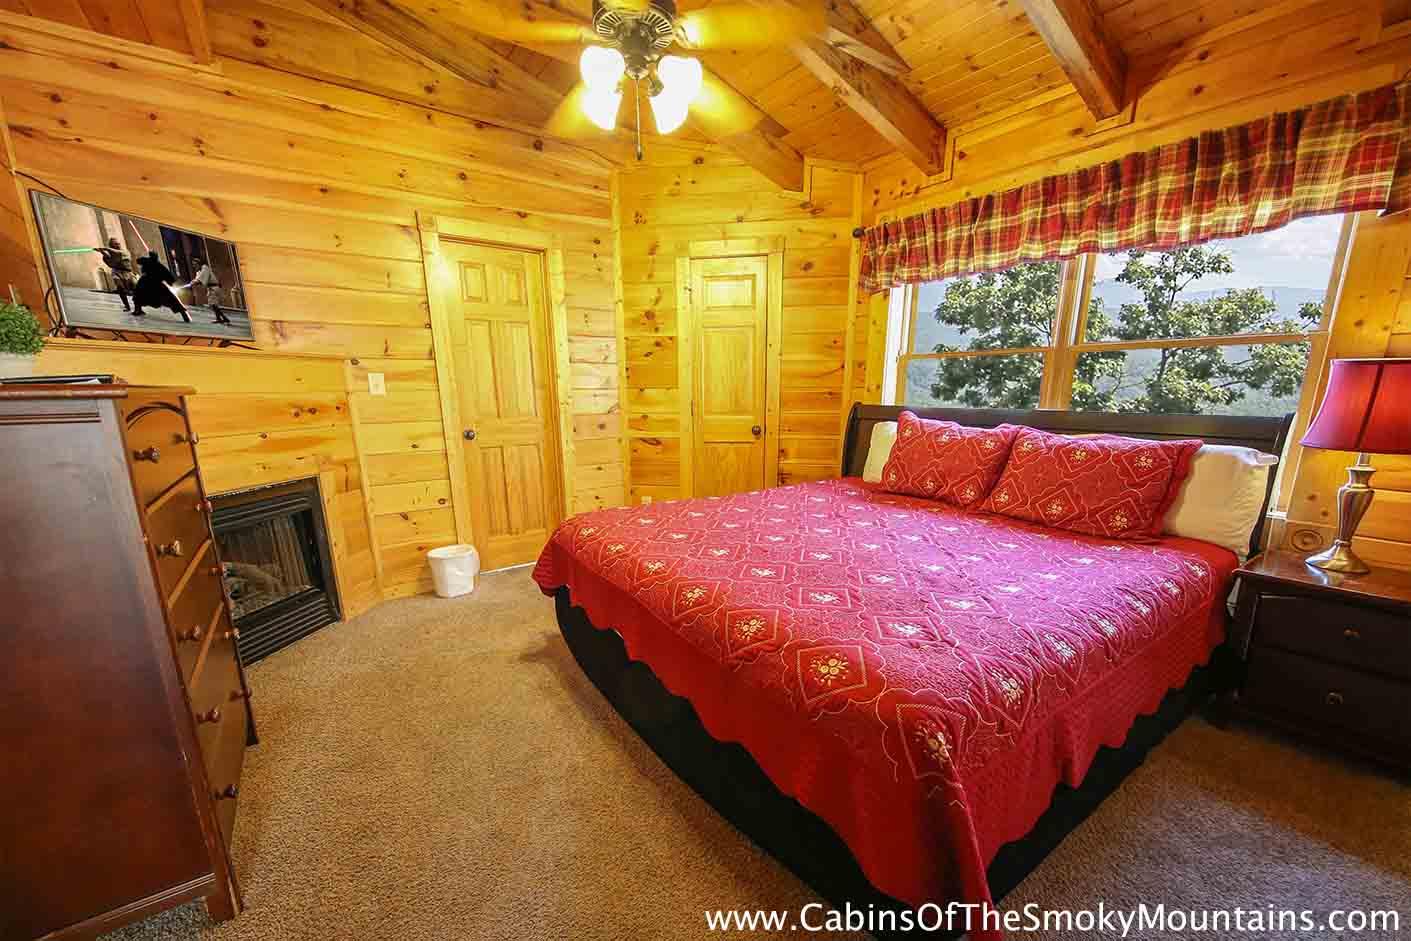 Gatlinburg Cabin Comfort Zone 3 Bedroom Sleeps 13 Jukebox Swimming Pool Access Home